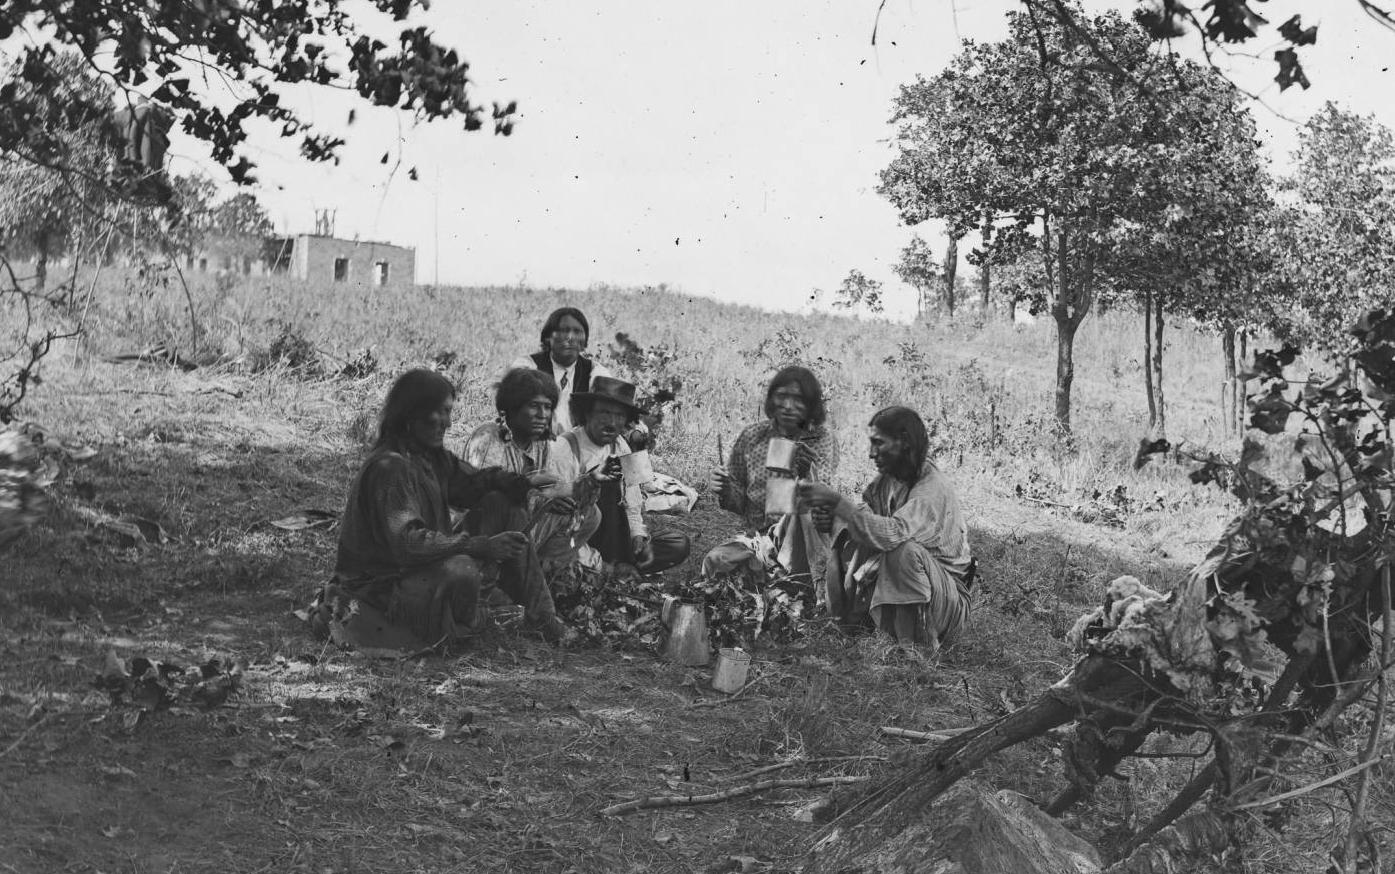 http://www.american-tribes.com/messageboards/dietmar/DangerousEagleBlackBear.jpg